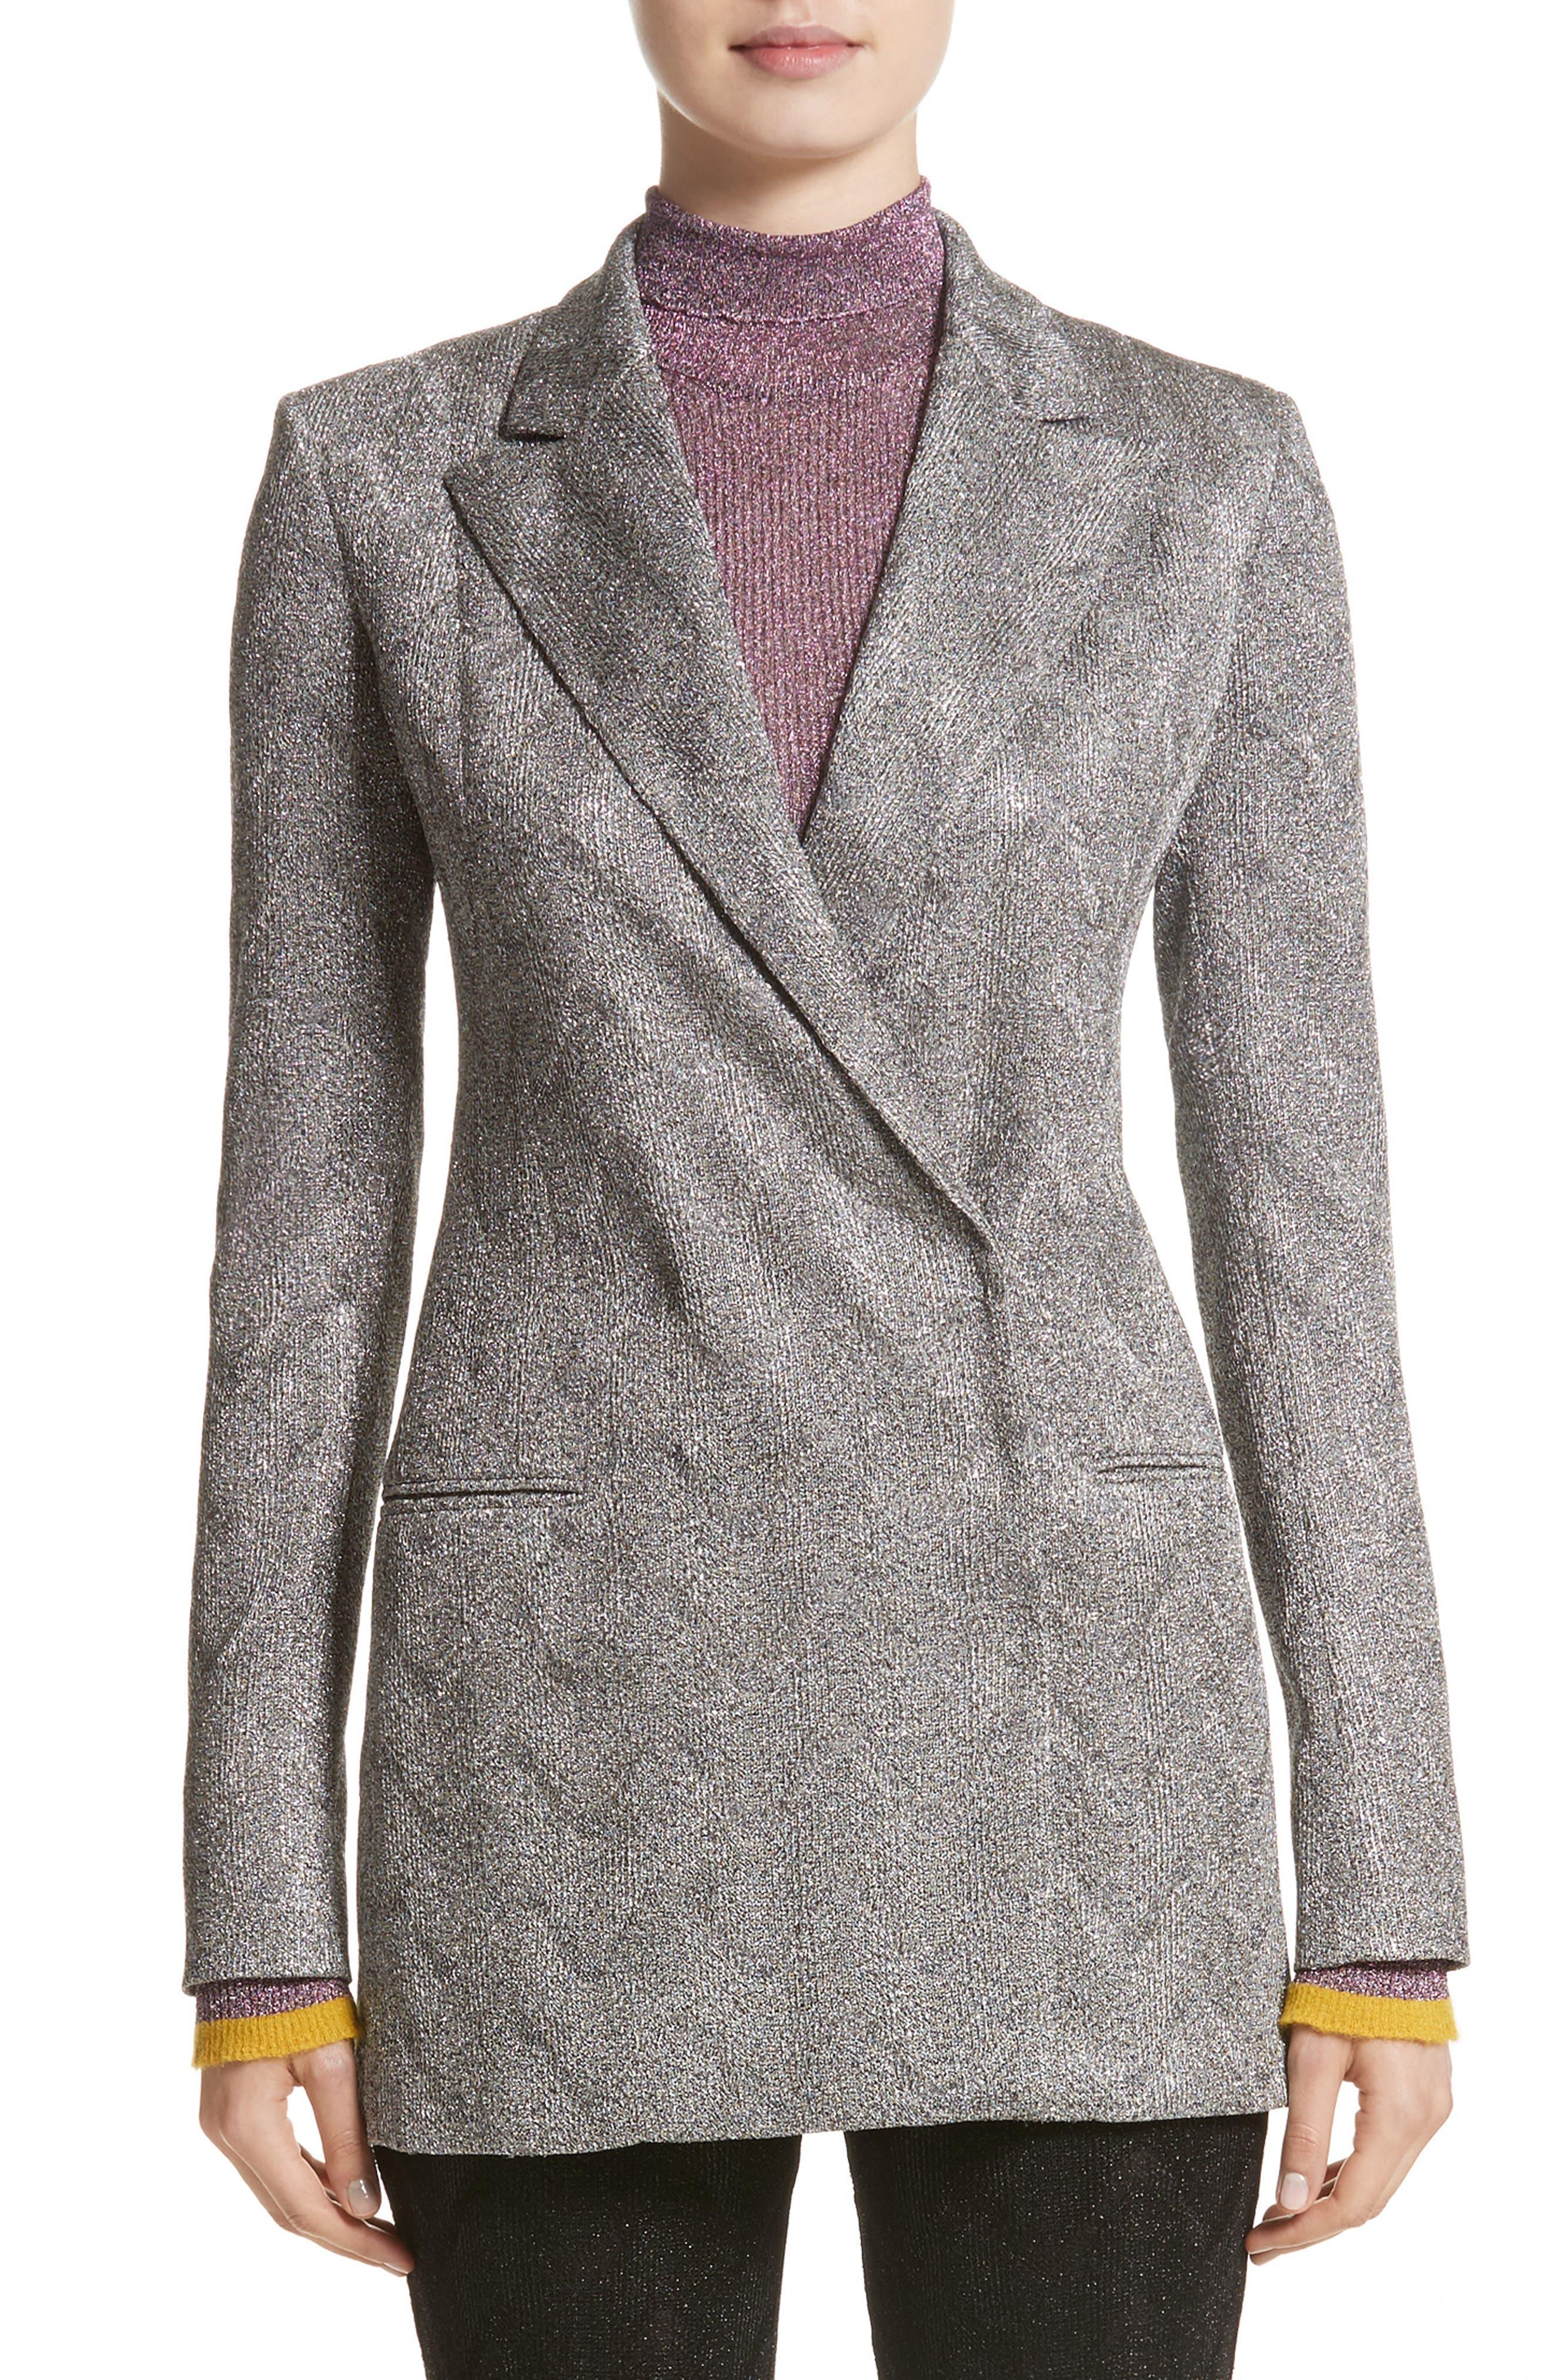 Main Image - Missoni Metallic Knit Double Breasted Jacket